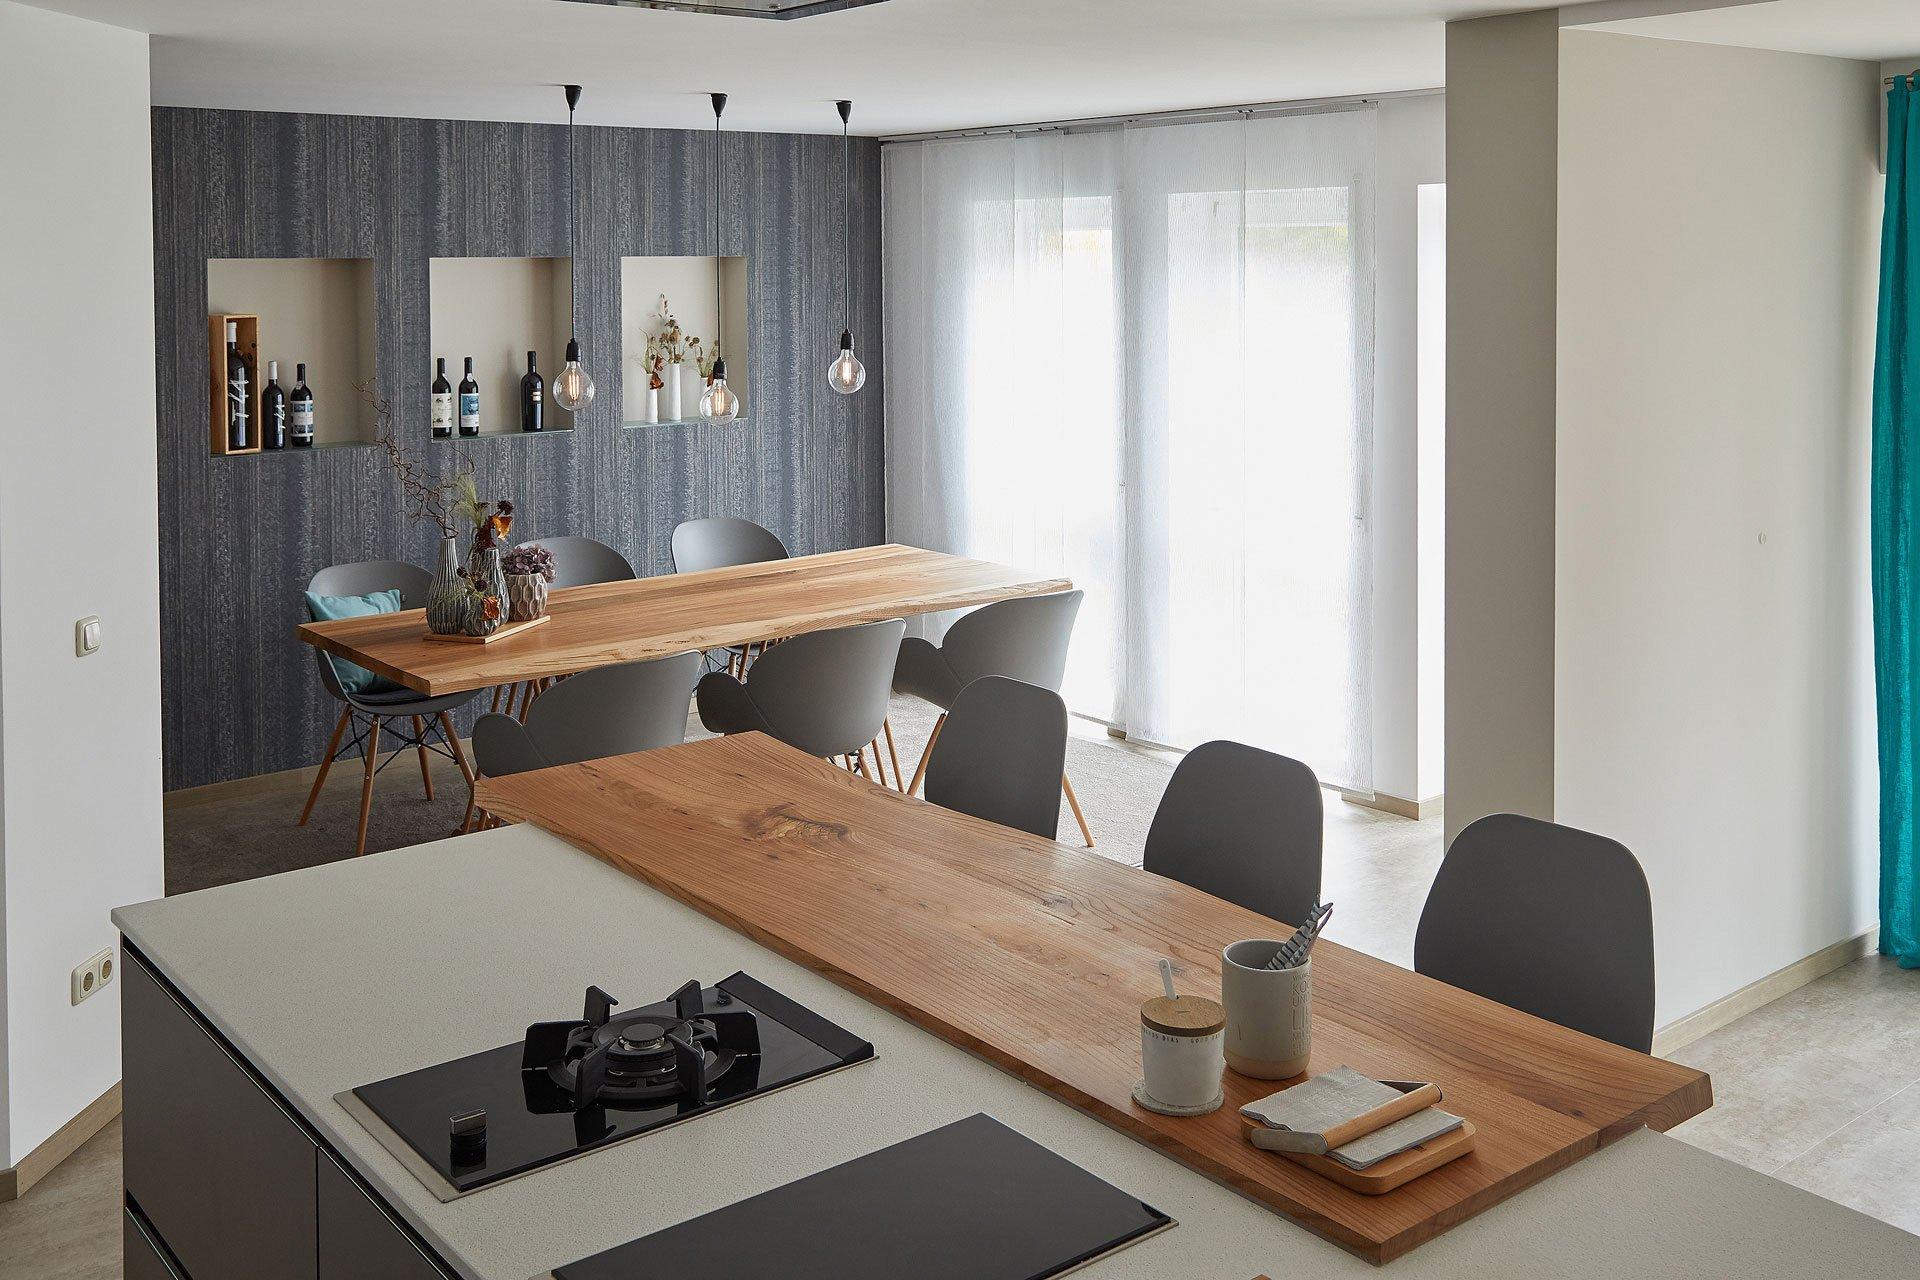 holzwerk frankfurt esstische aus massivholz. Black Bedroom Furniture Sets. Home Design Ideas